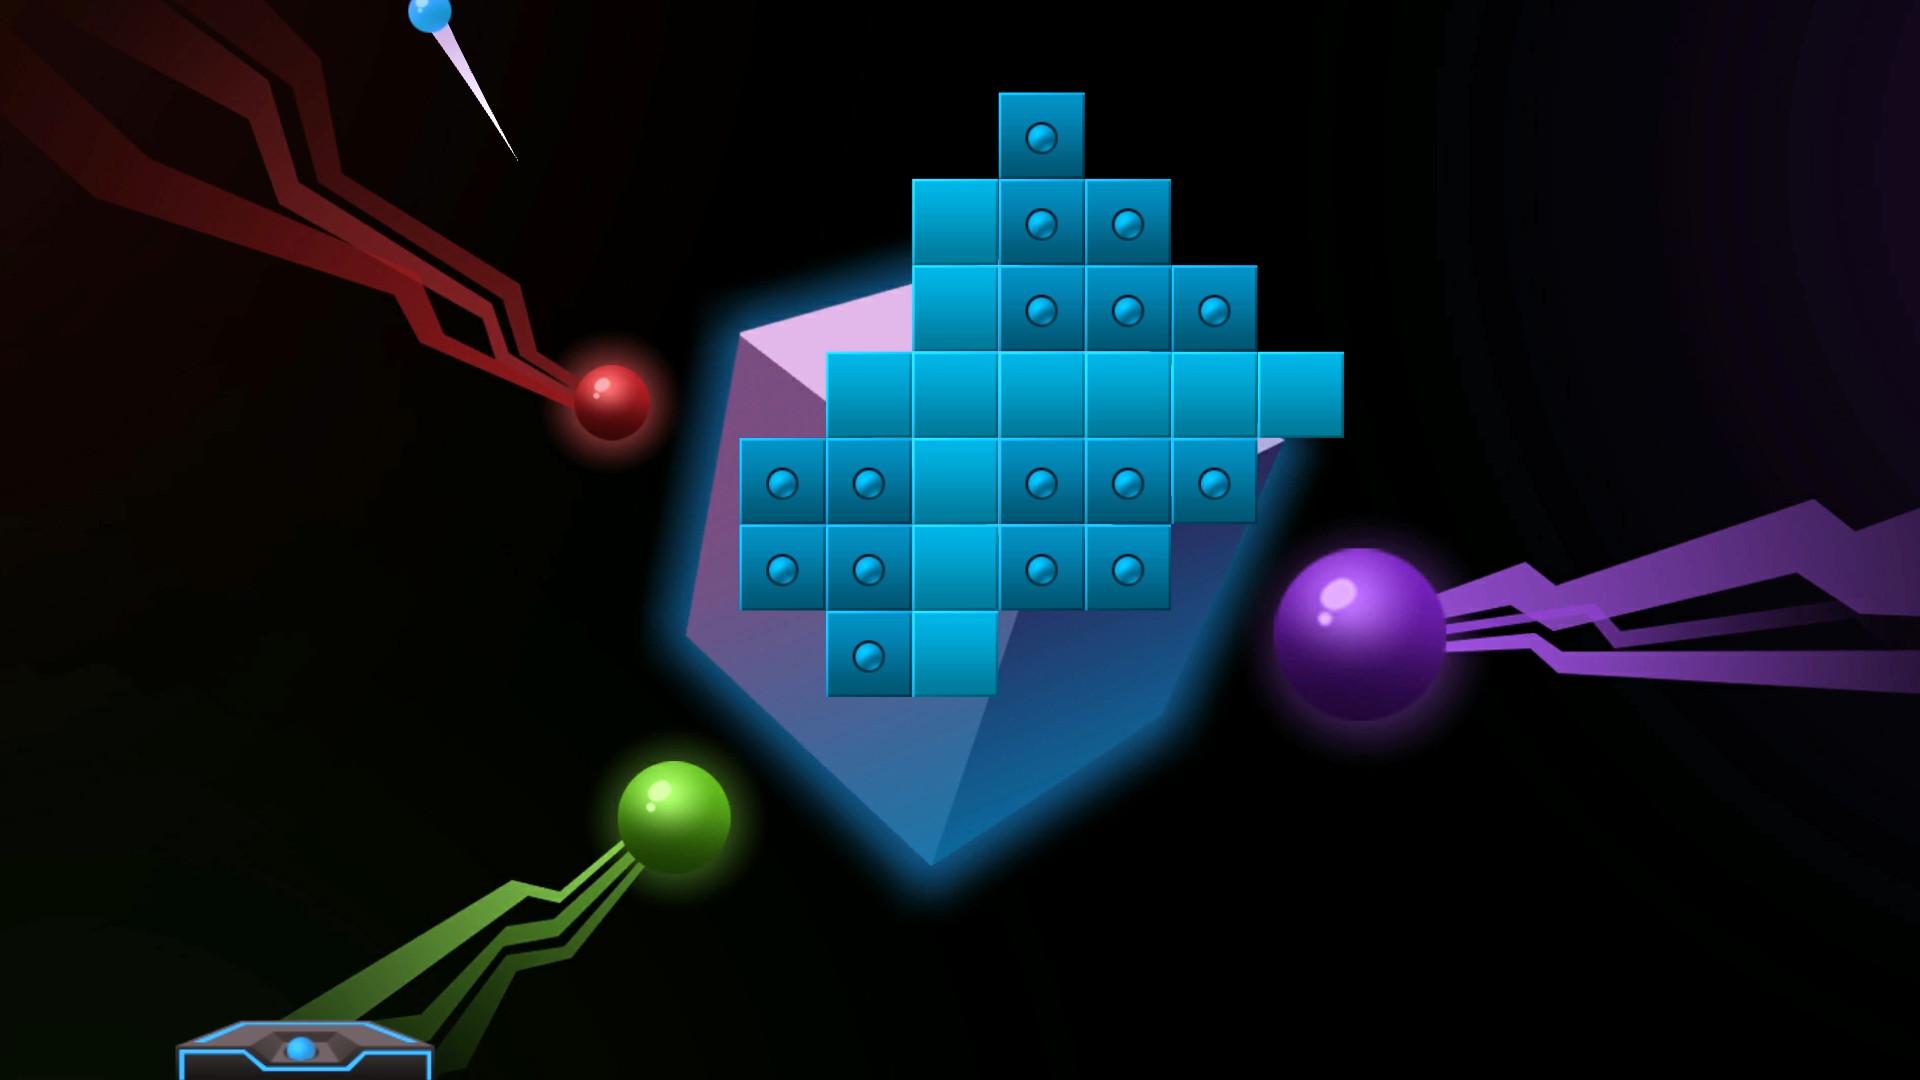 BAX (Brick-breaker) Ss_19f95383f58ea50e6af6c61fbebfaa5042c6e544.1920x1080